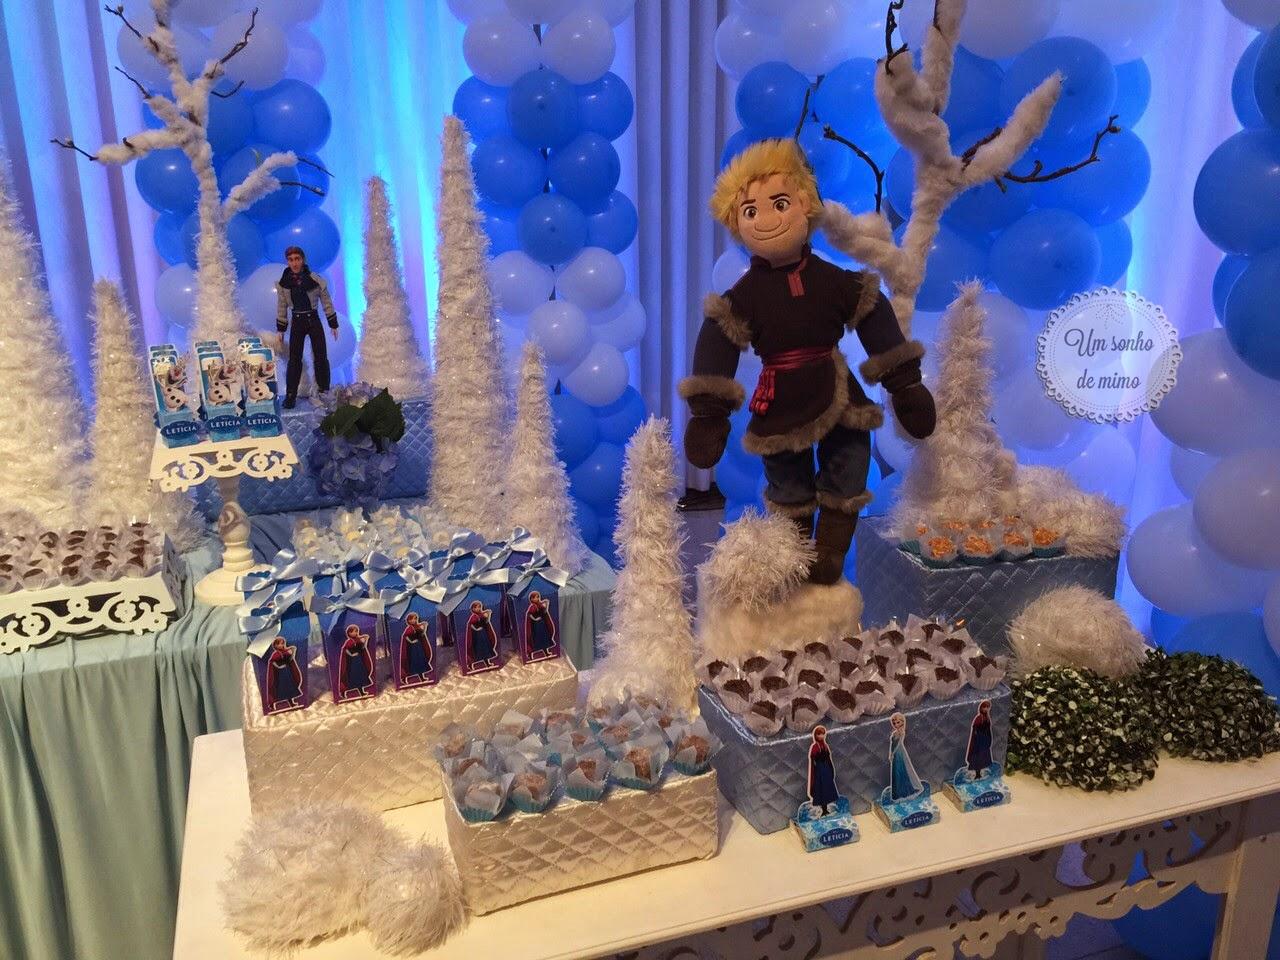 personalizados Frozen, festa frozen, Frozen, Frozen BH, tubete personalizado, tubete frozen